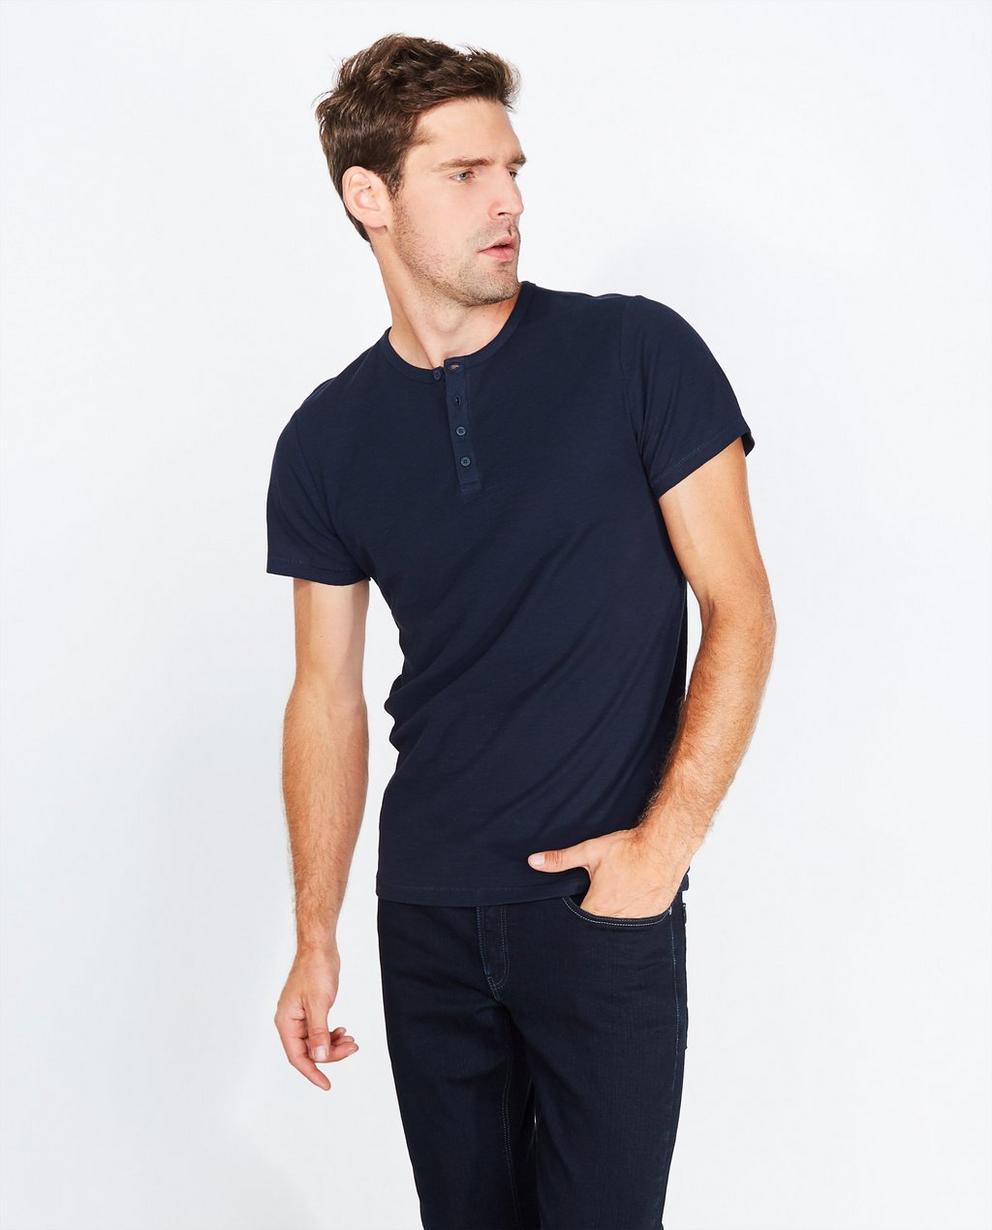 Marineblauw T-shirt - met knopenrij - Quarterback